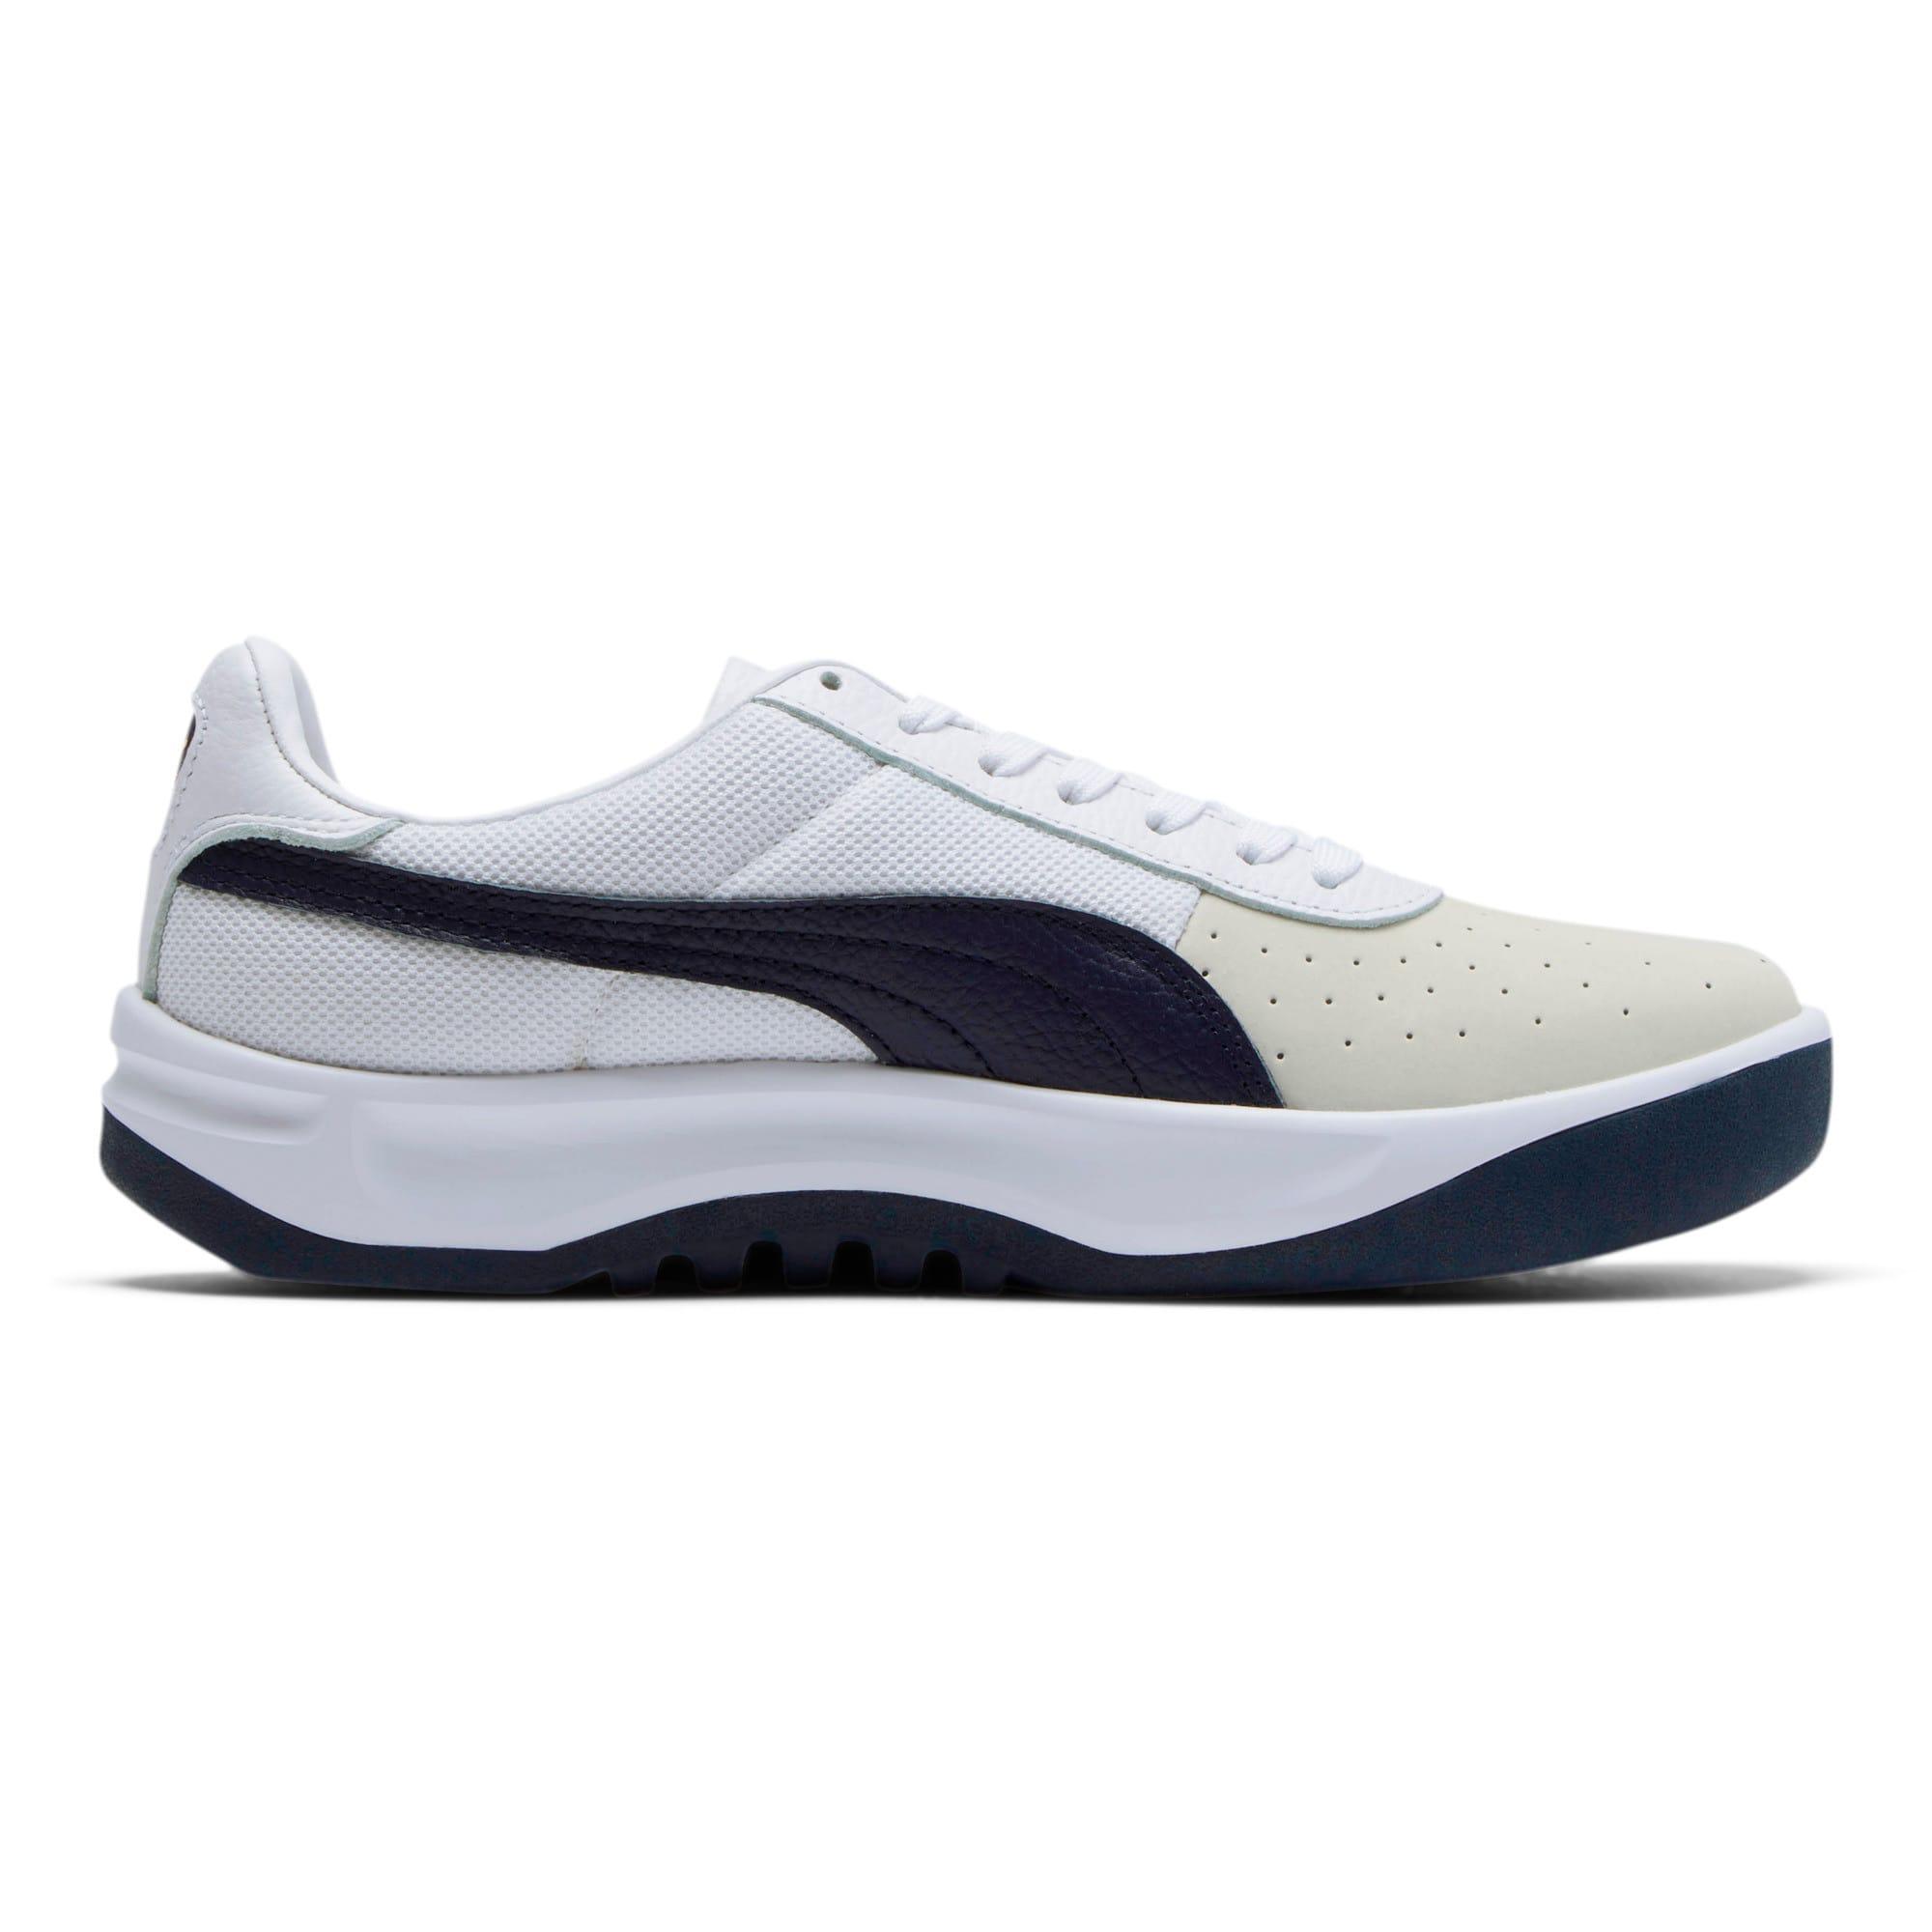 Thumbnail 5 of California Casual Sneakers, P White-Peacoat-P White, medium